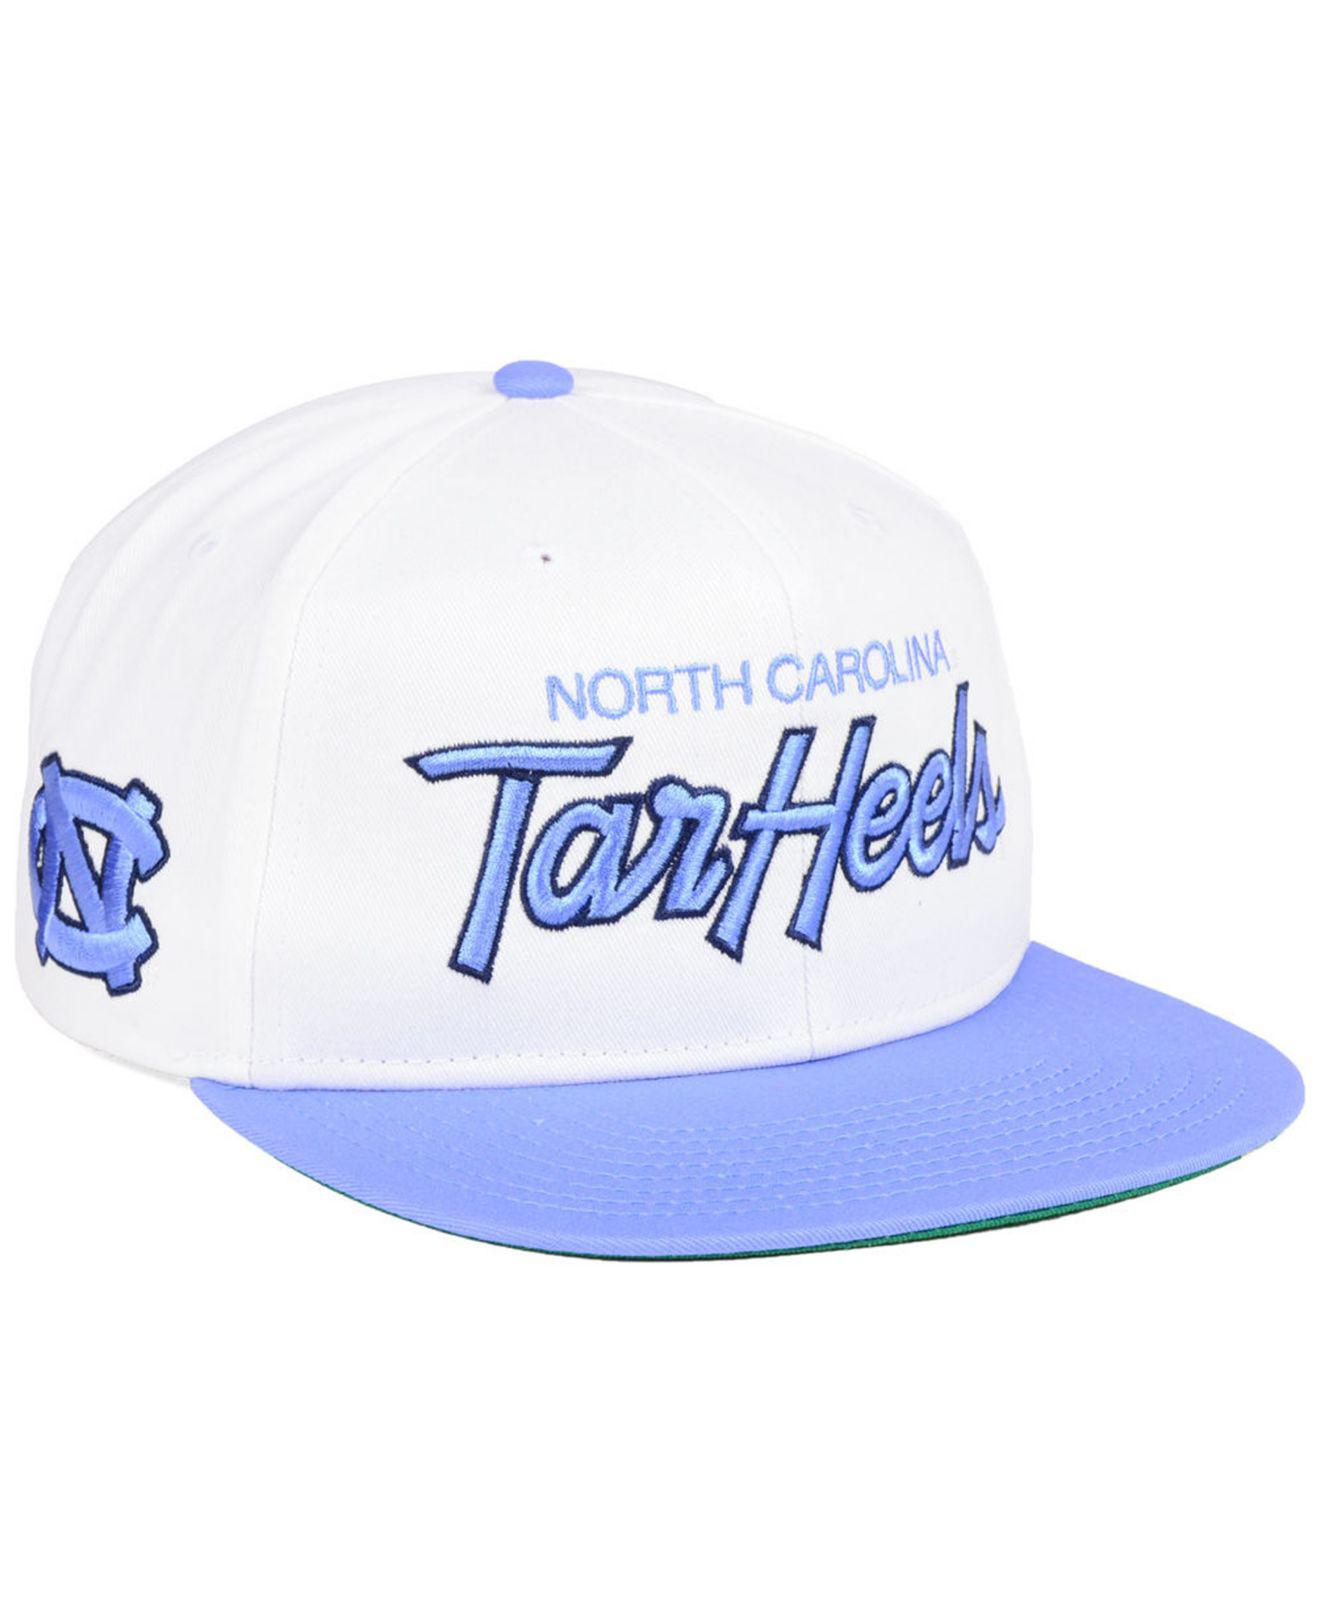 14d609e7668 Nike. Men s White North Carolina Tar Heels Sport Specialties Snapback Cap